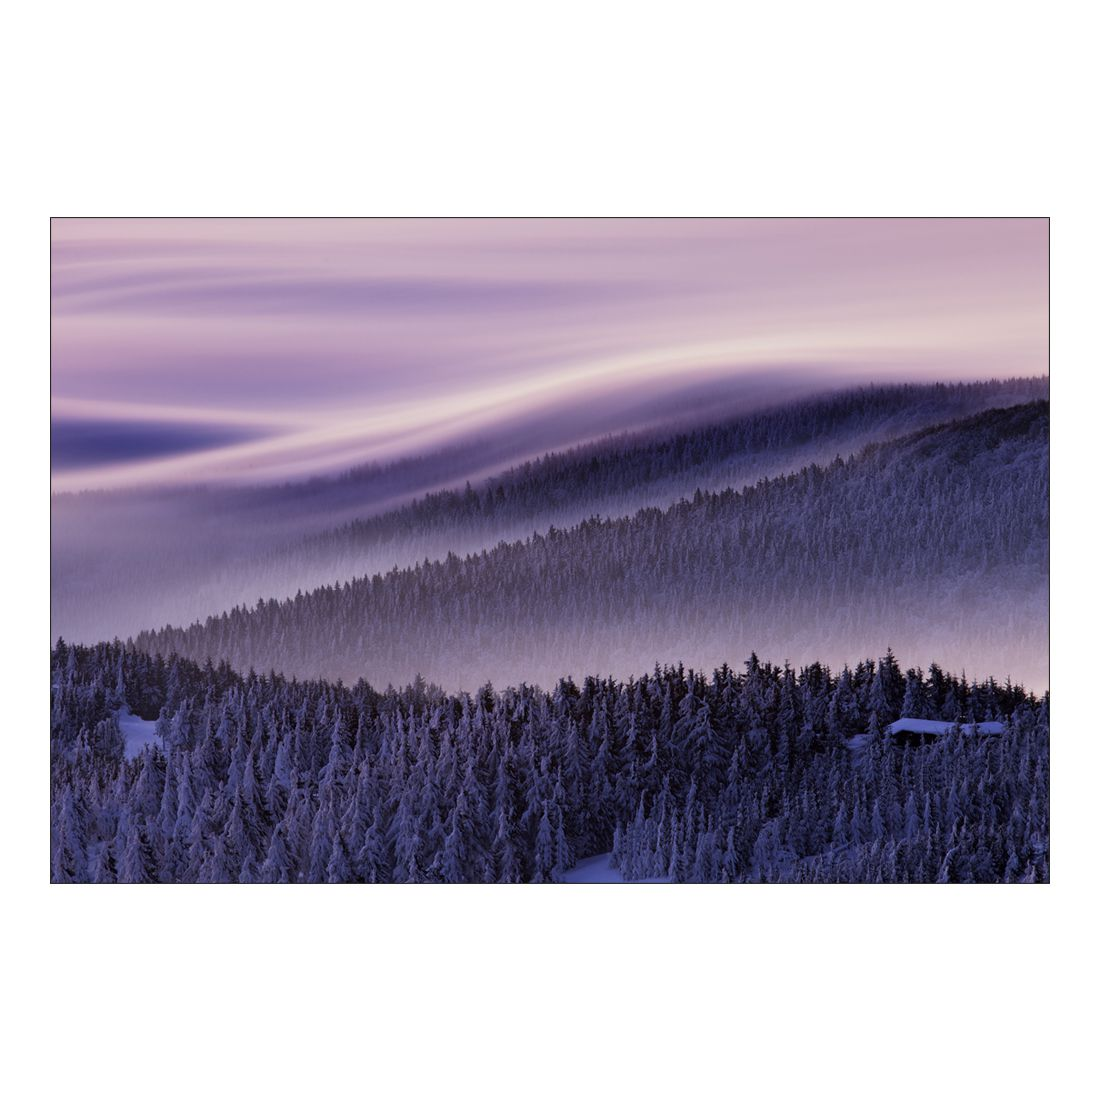 Acrylglasbild Pine Forest in Snow – Abmessung 60×40 cm, Gallery of Innovative Art günstig